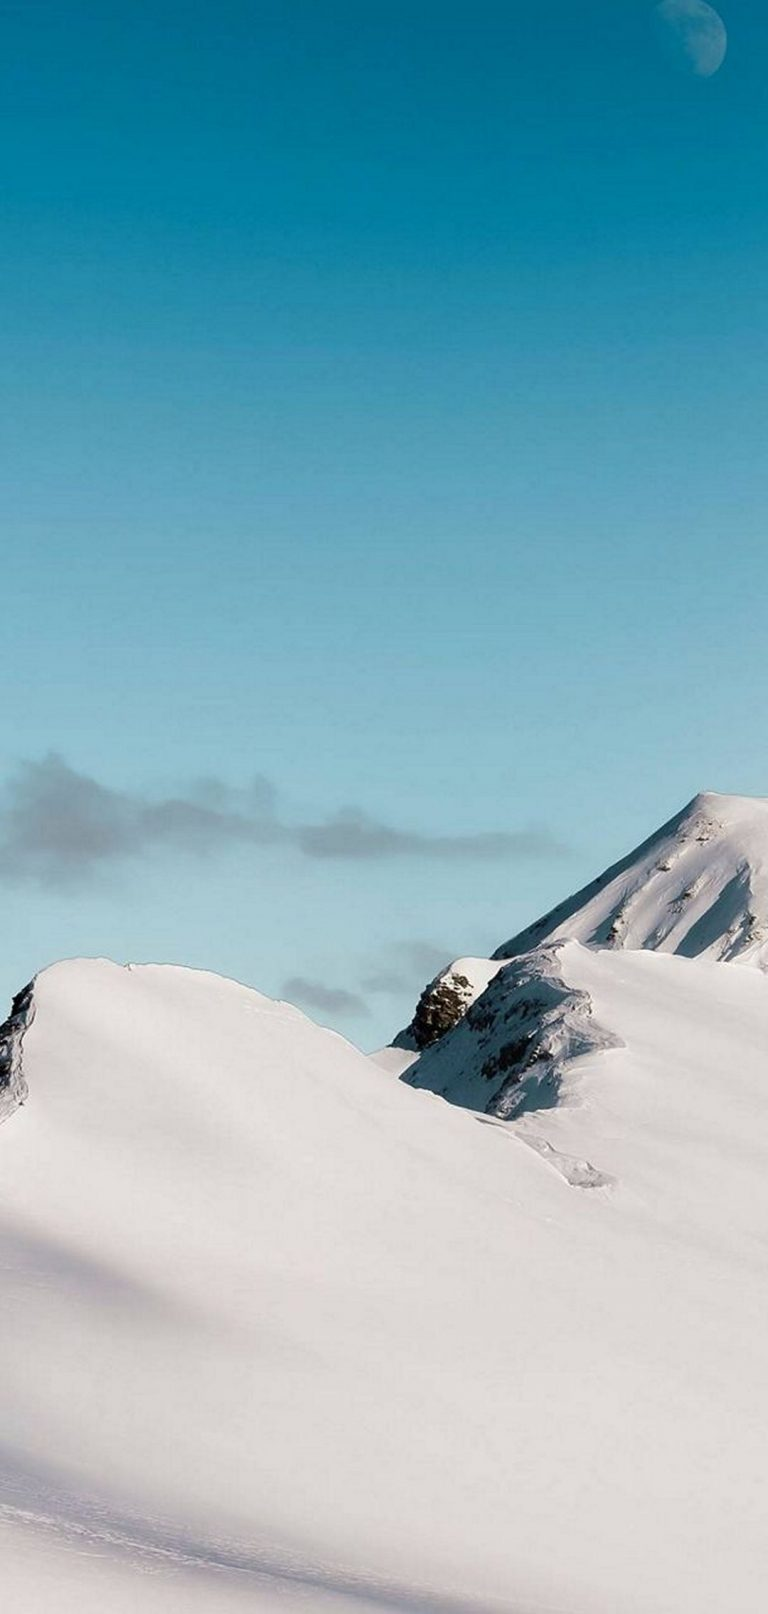 Top Mountain Cloud Minimalism 1080x2270 768x1614